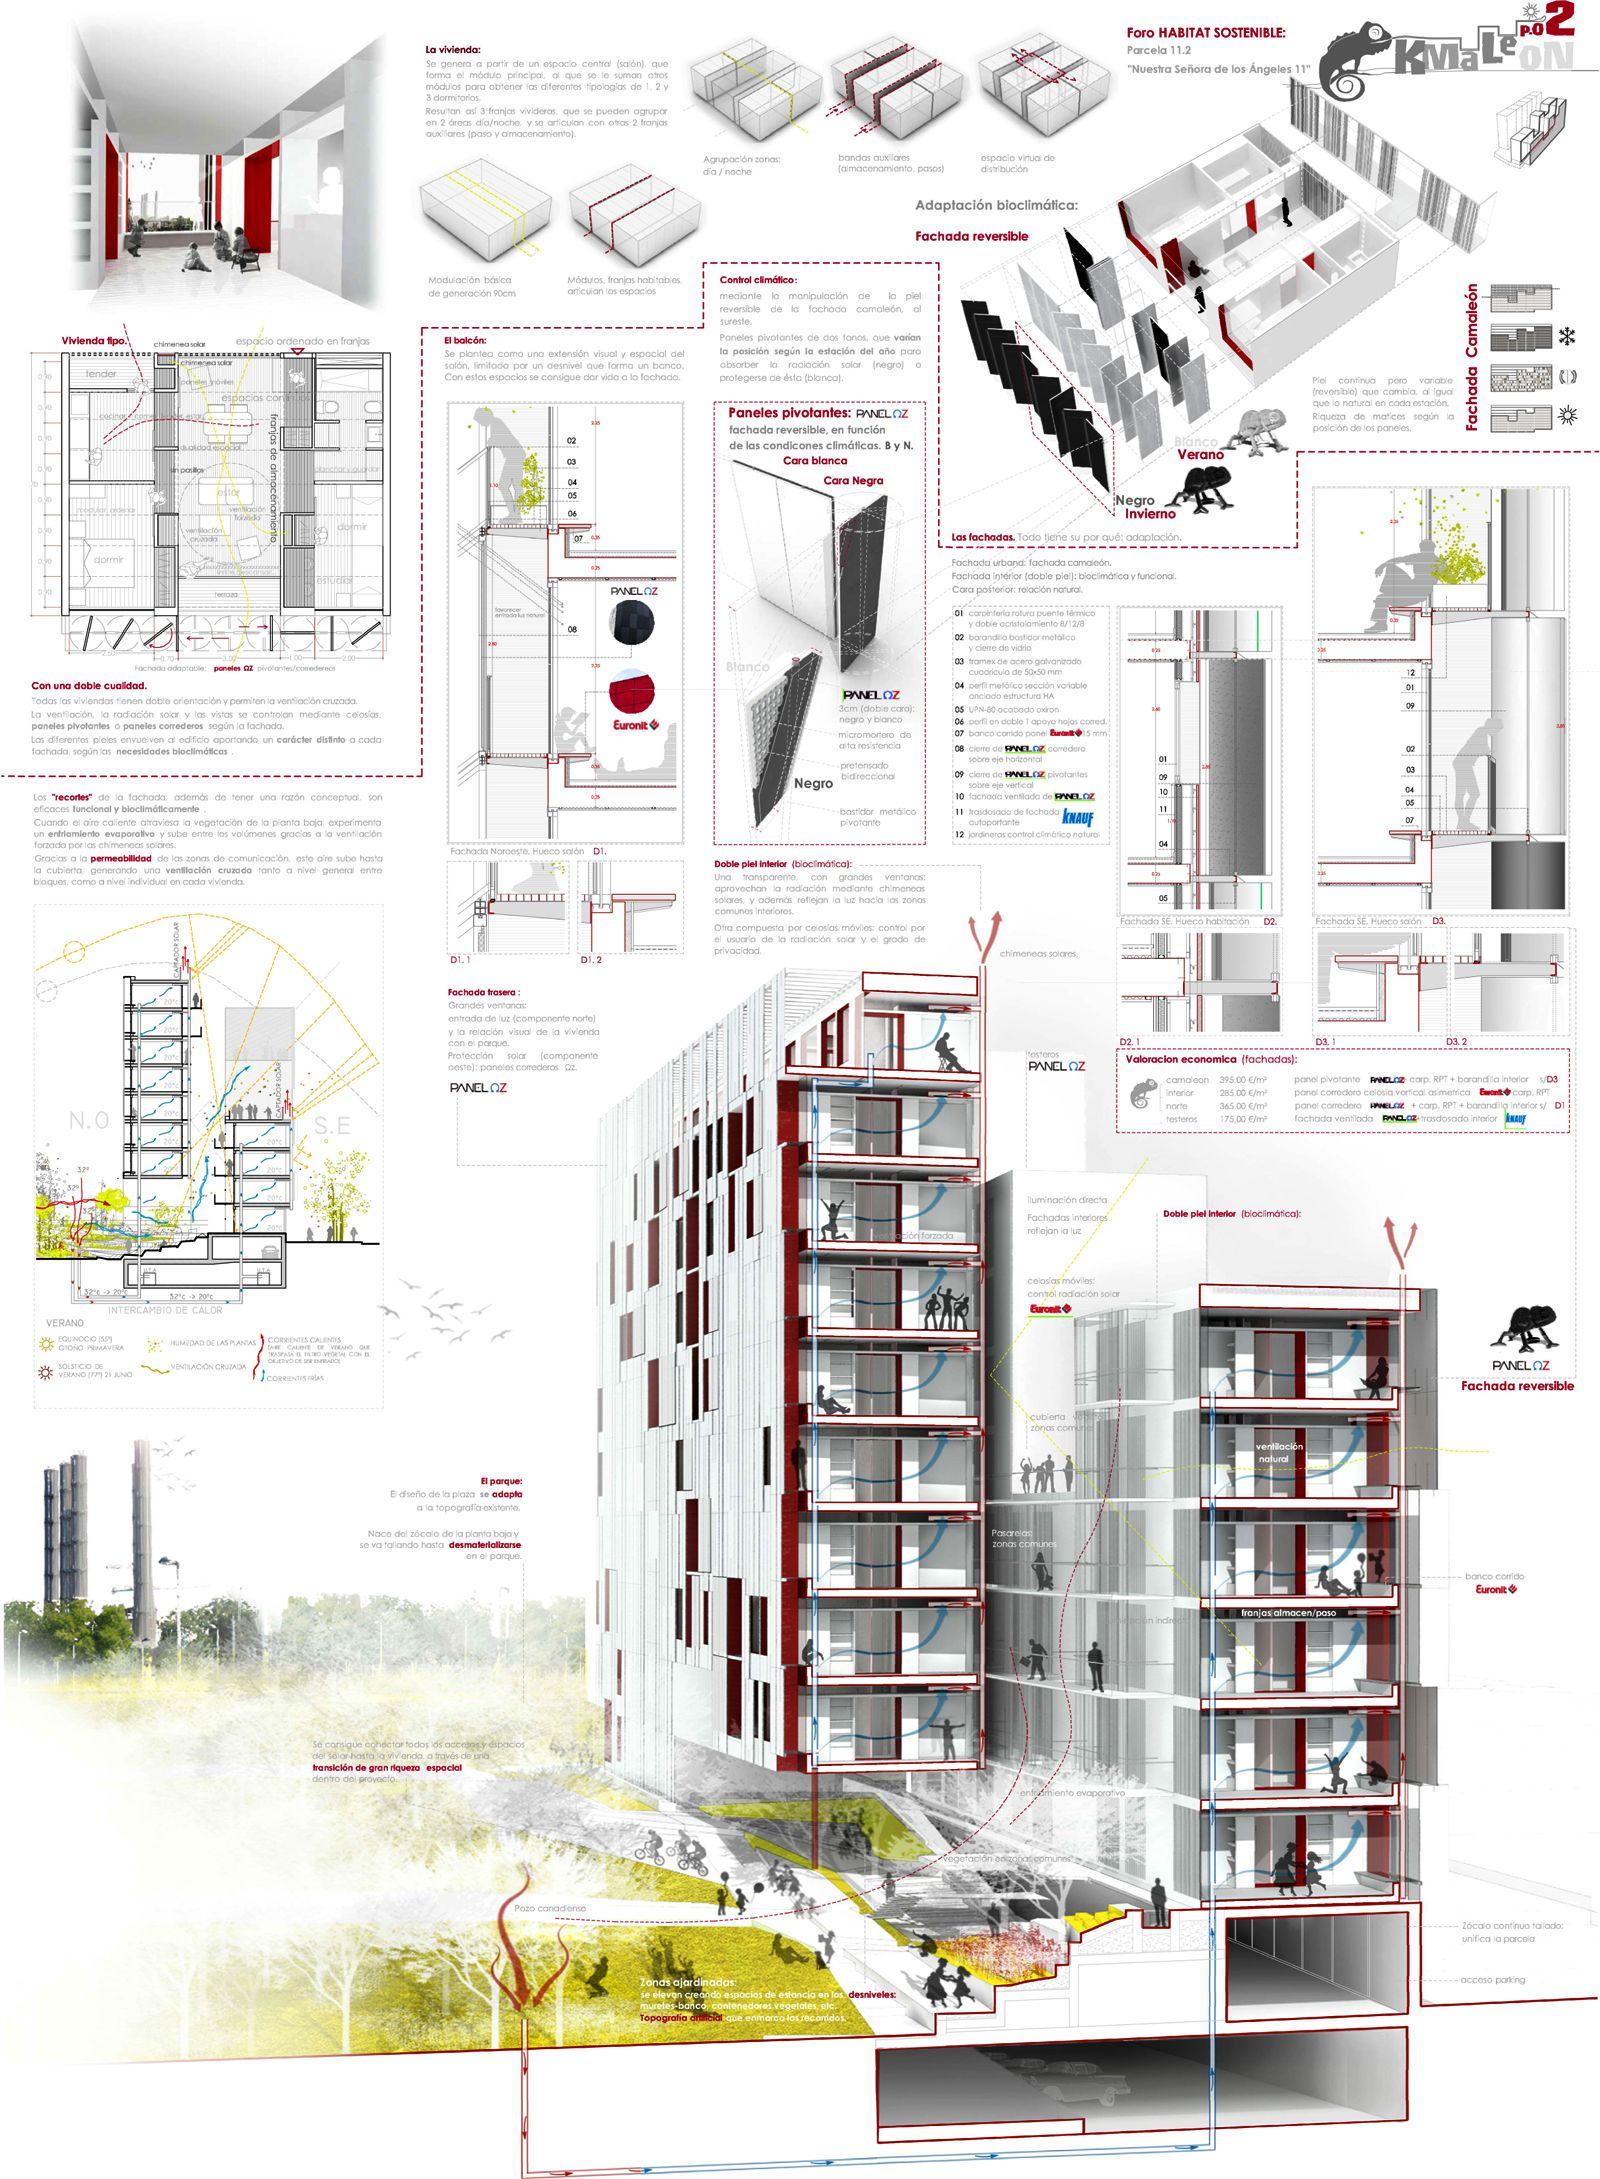 Kmalaeon conjunto de viviendas gea arquitectos for New home construction insurance